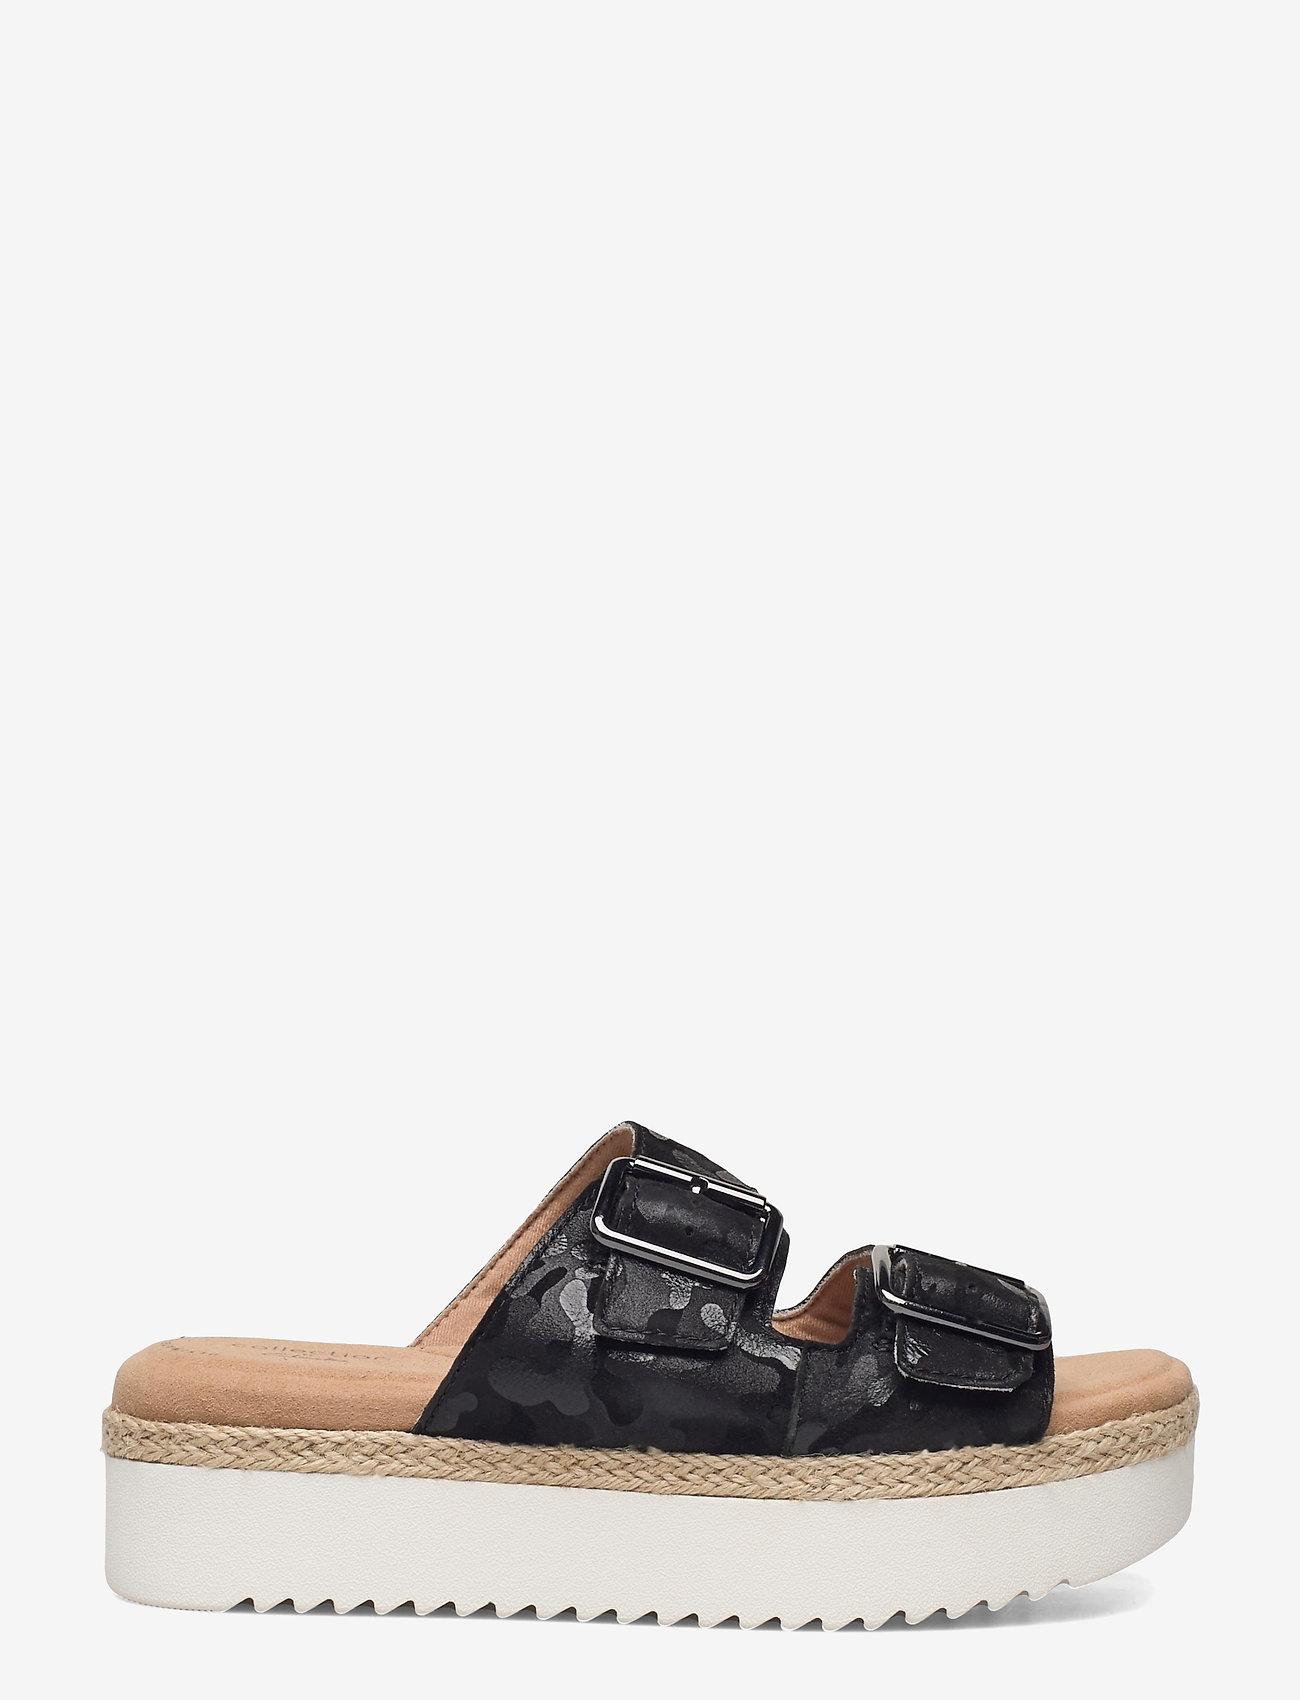 Clarks - Lana Beach - platta sandaler - black interest - 1